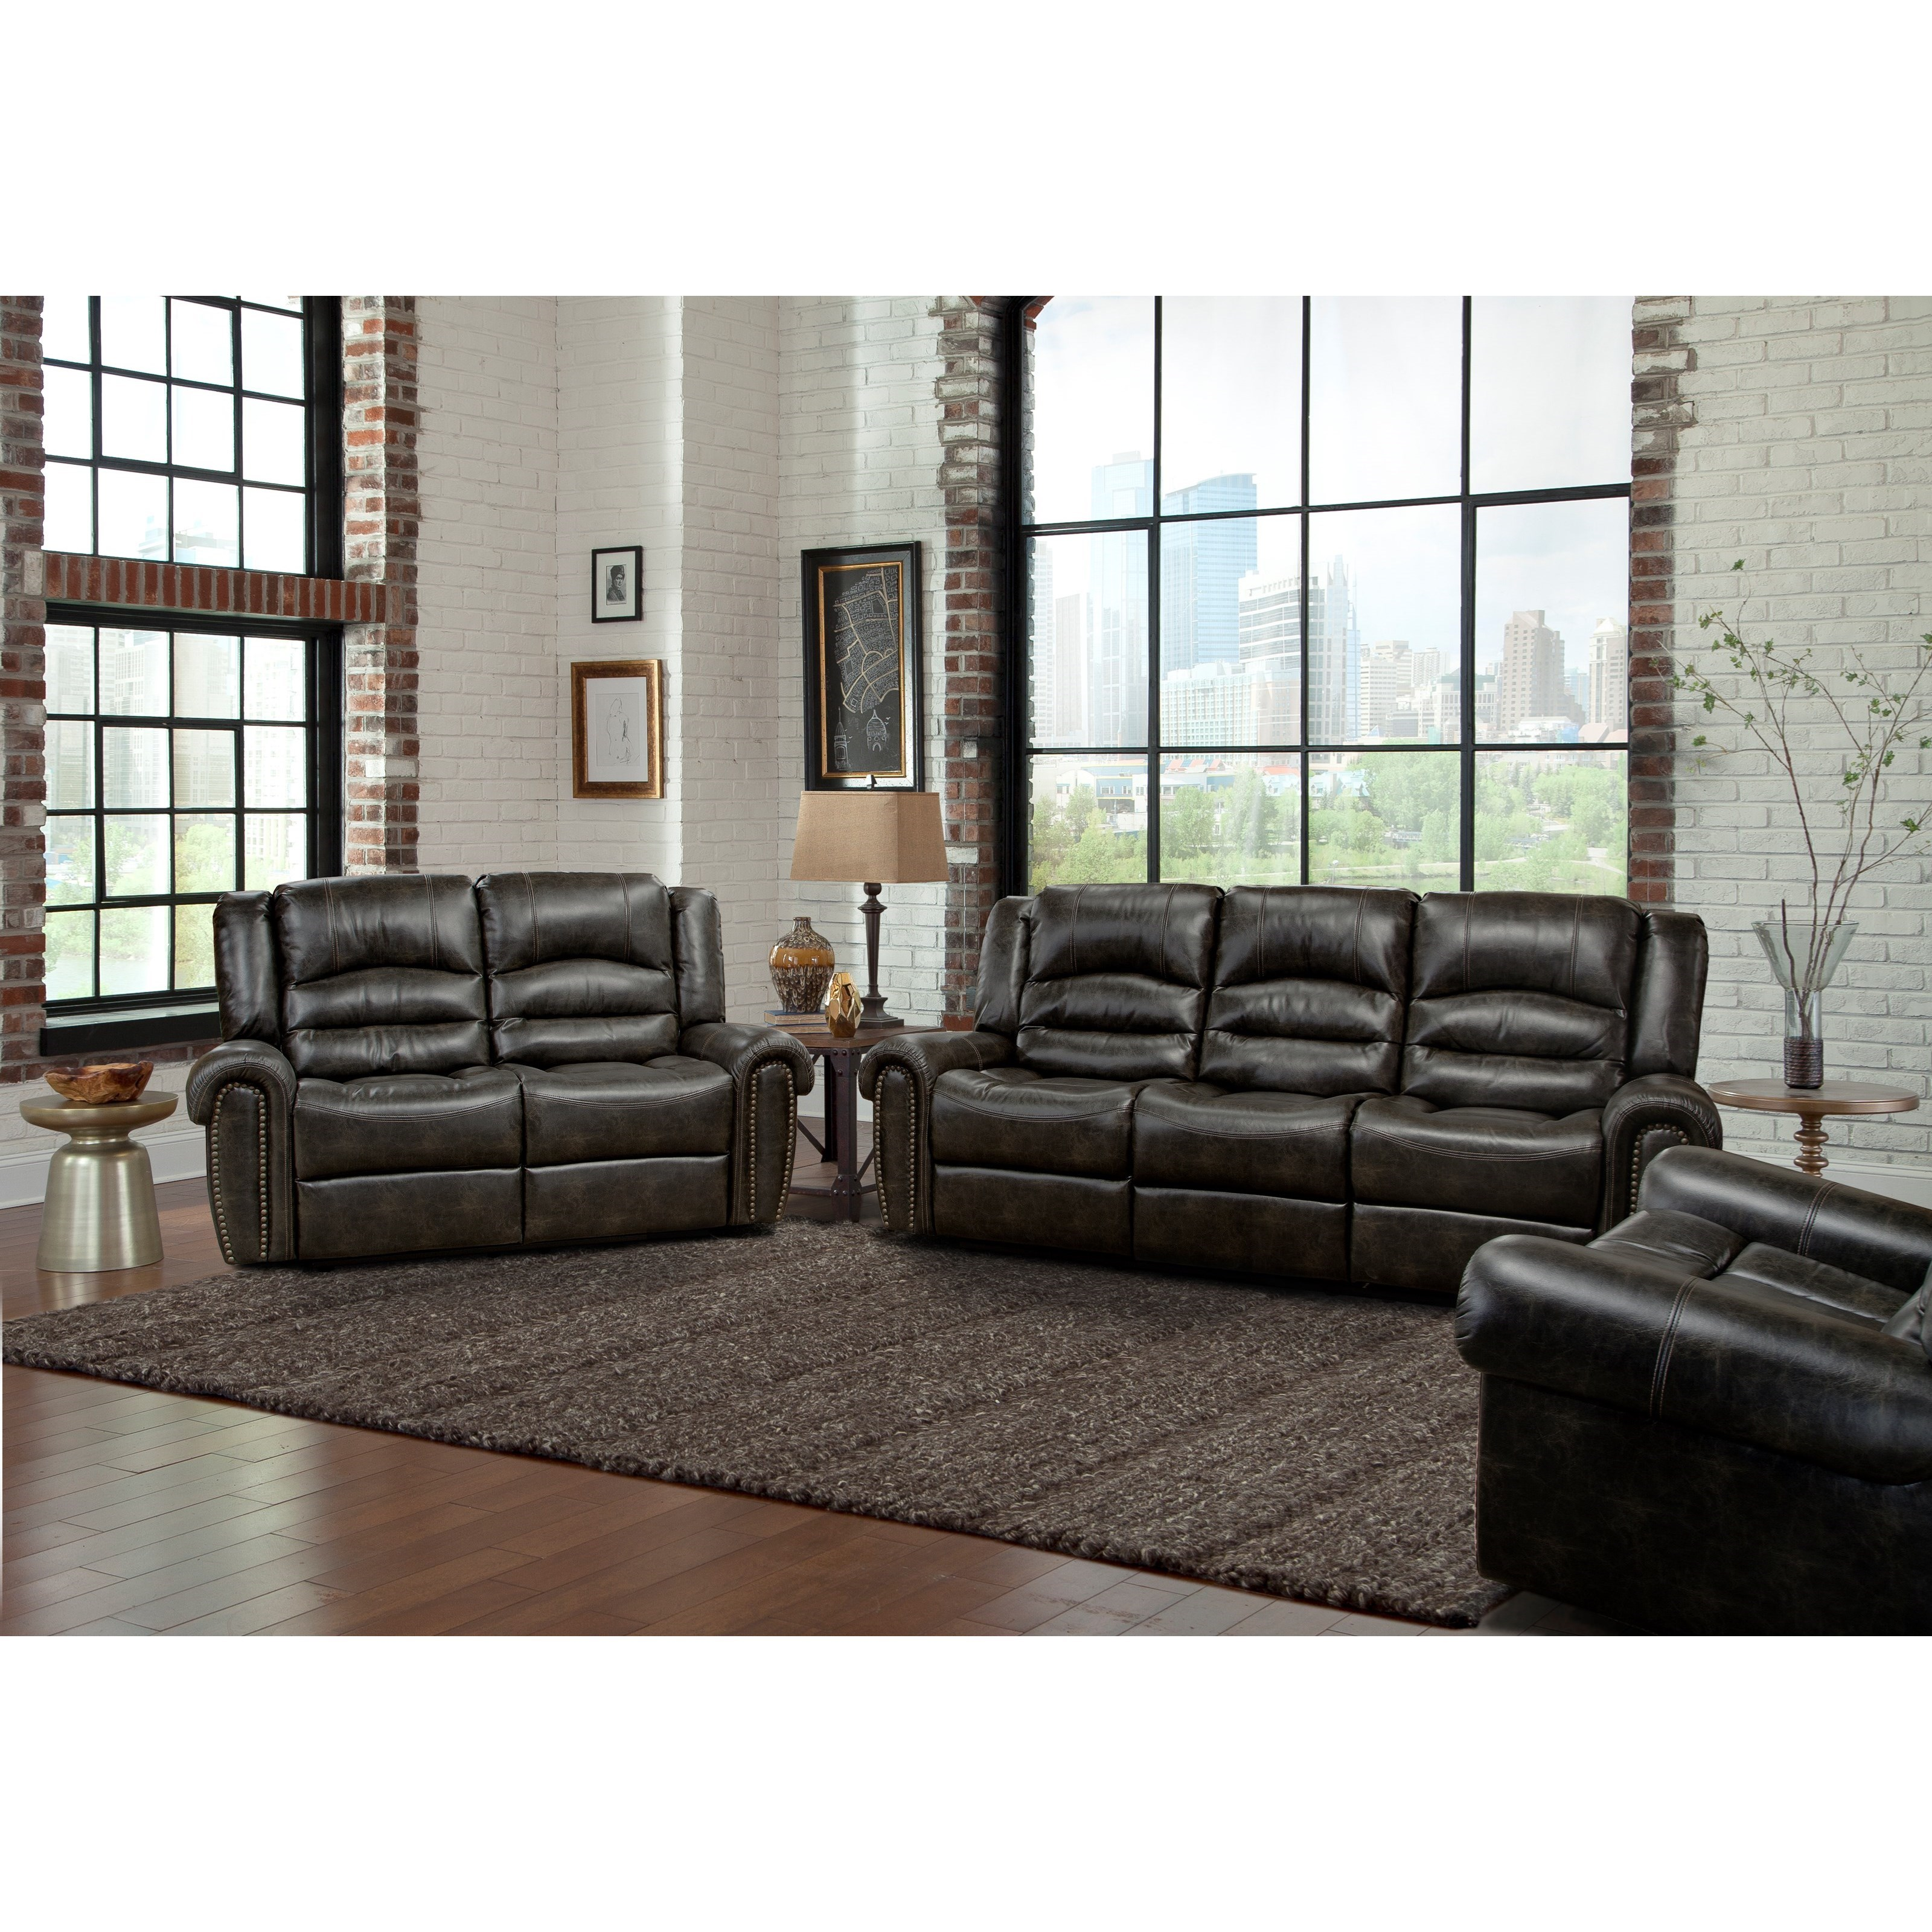 Parker Living Gershwin Reclining Living Room Group - Item Number: MGER Reclining Living Room Group 1